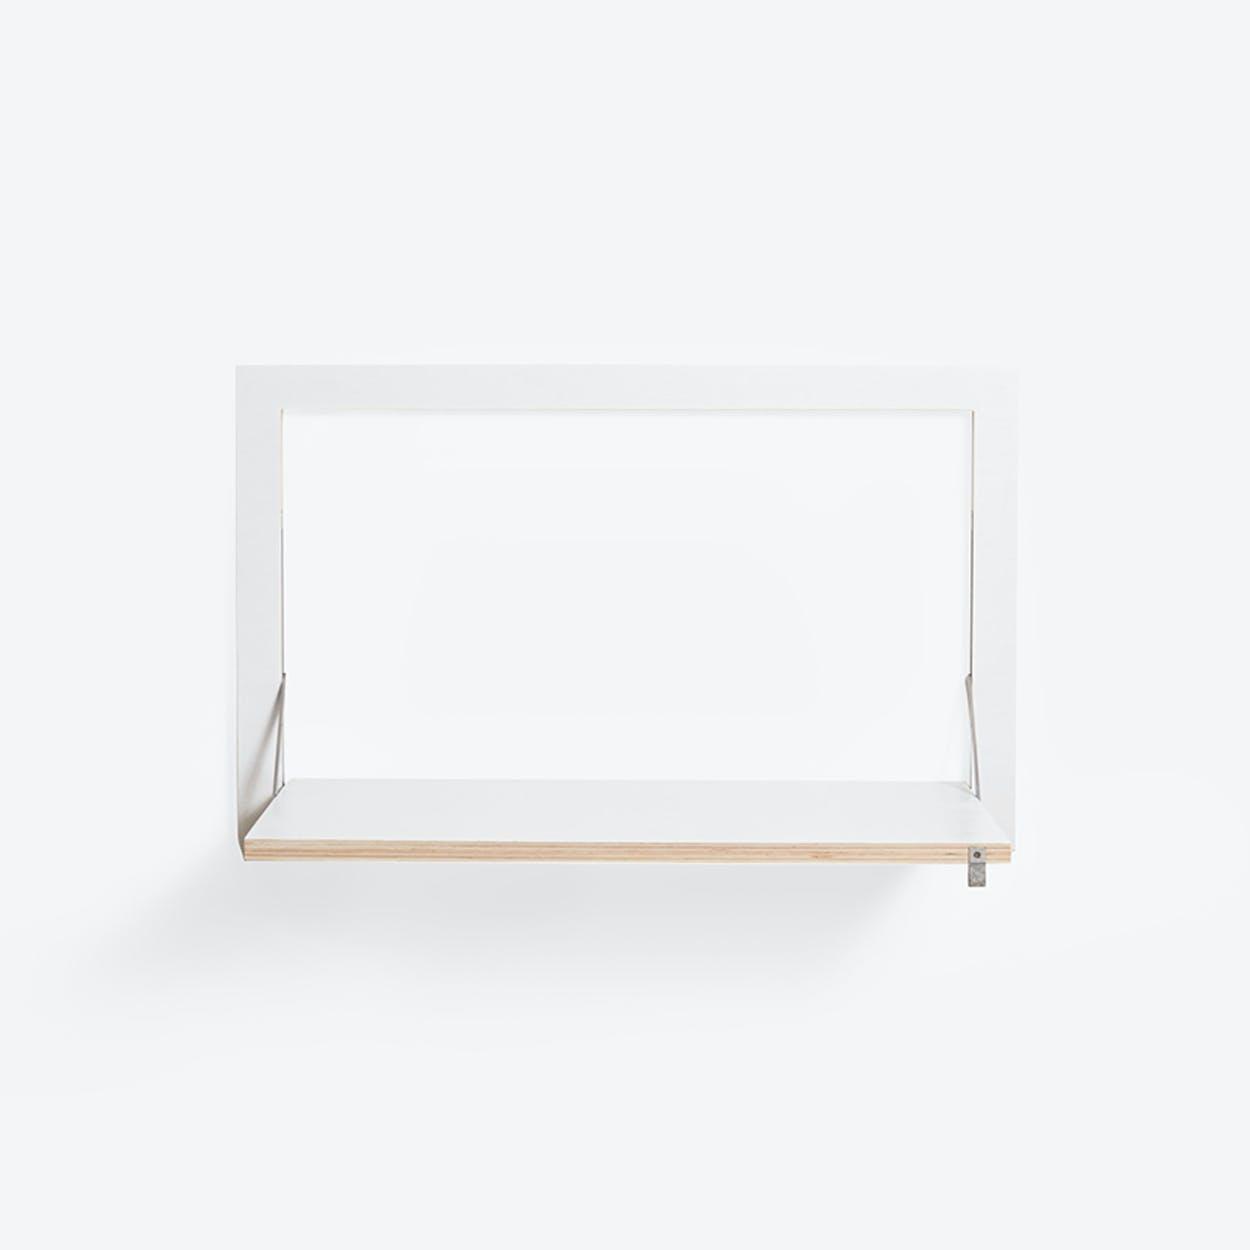 Fläpps Wall Desk/Secretary - White